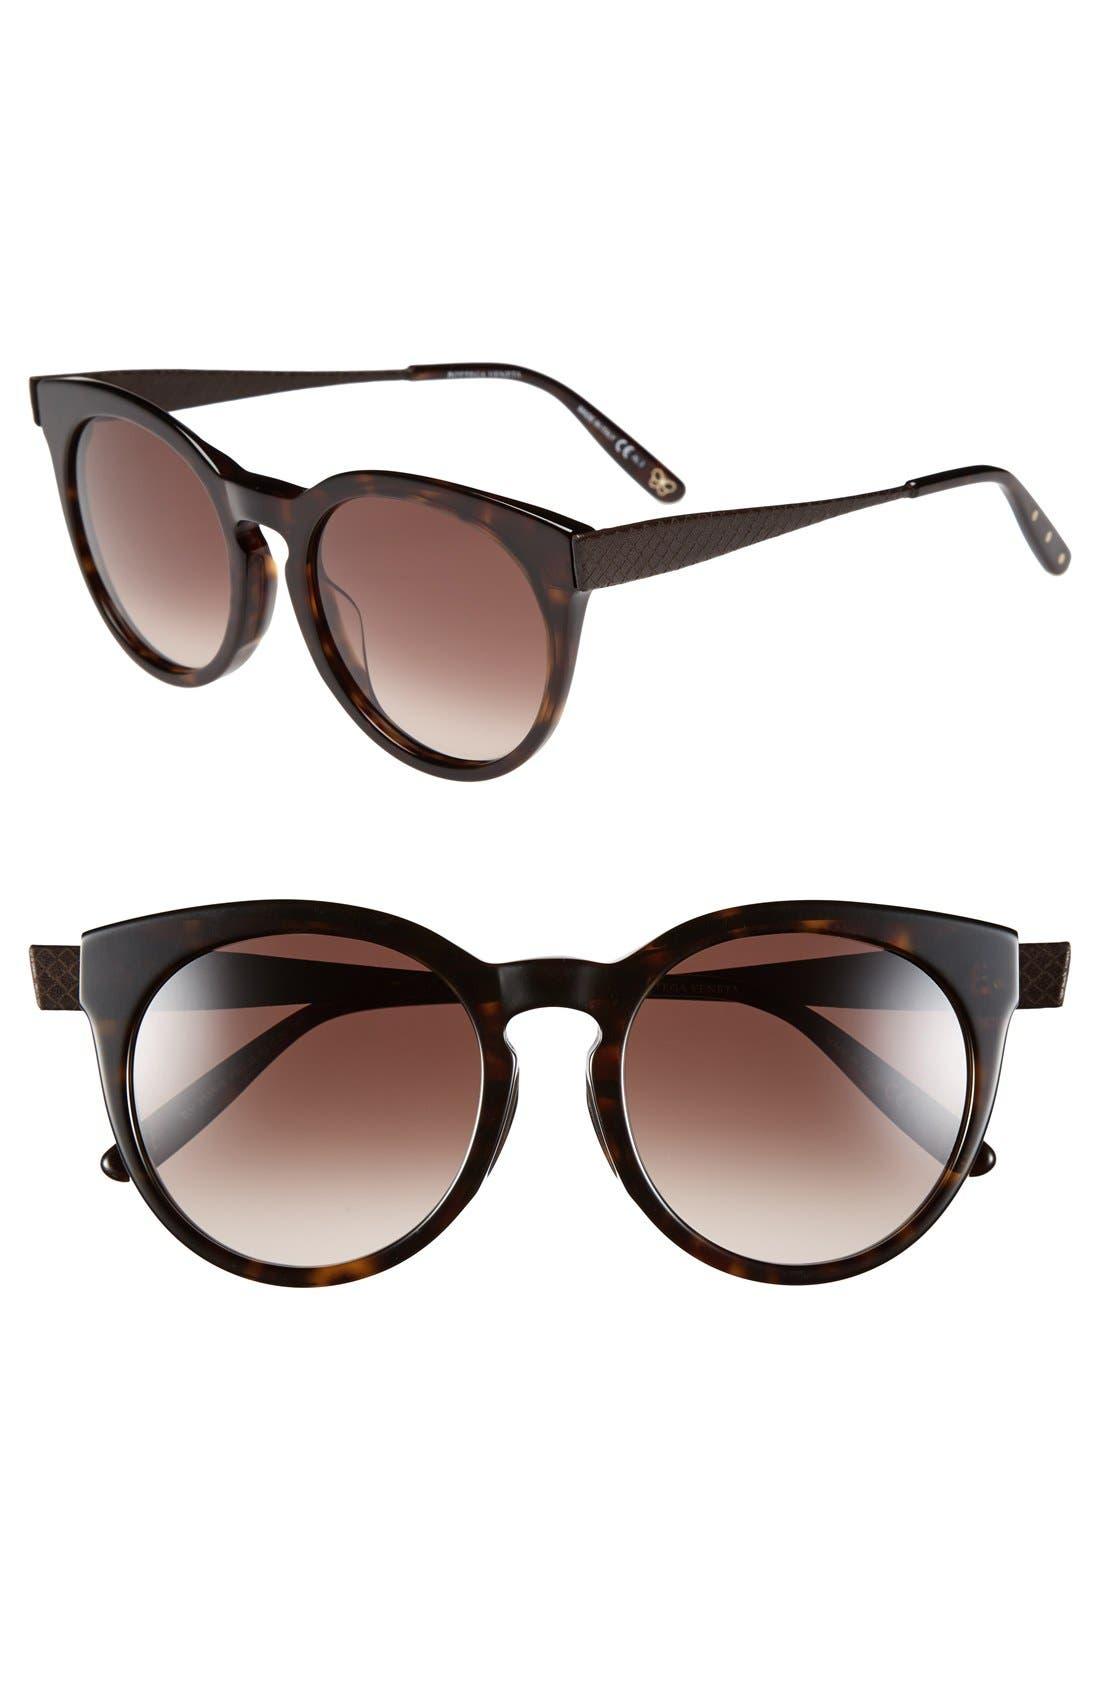 Main Image - Bottega Veneta 52mm Special Fit Sunglasses